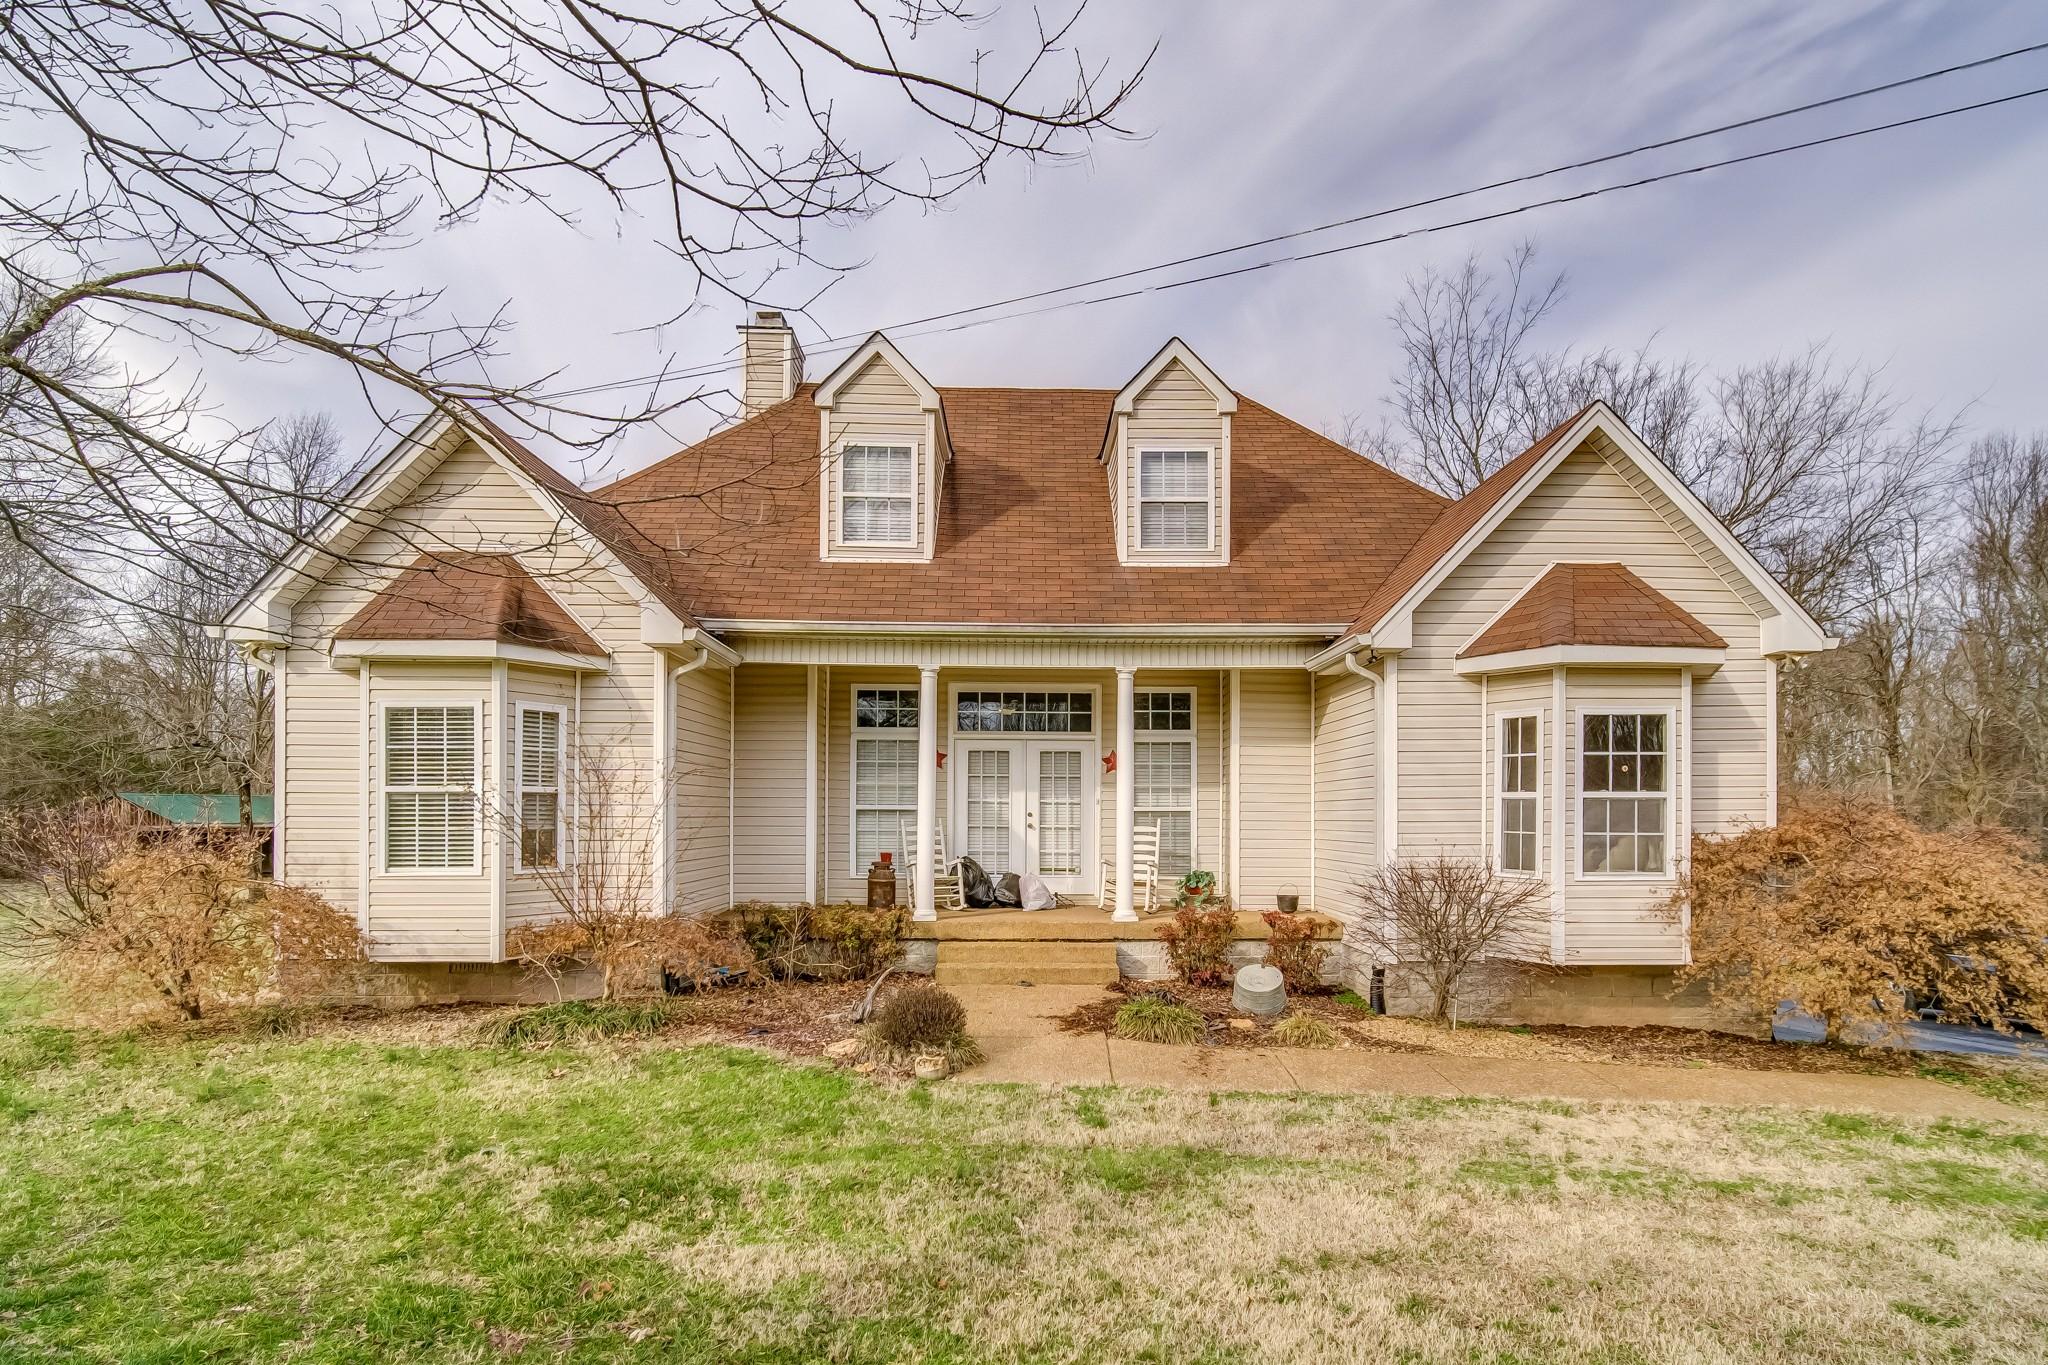 6105 Old Hickory Blvd, Whites Creek, TN 37189 - Whites Creek, TN real estate listing